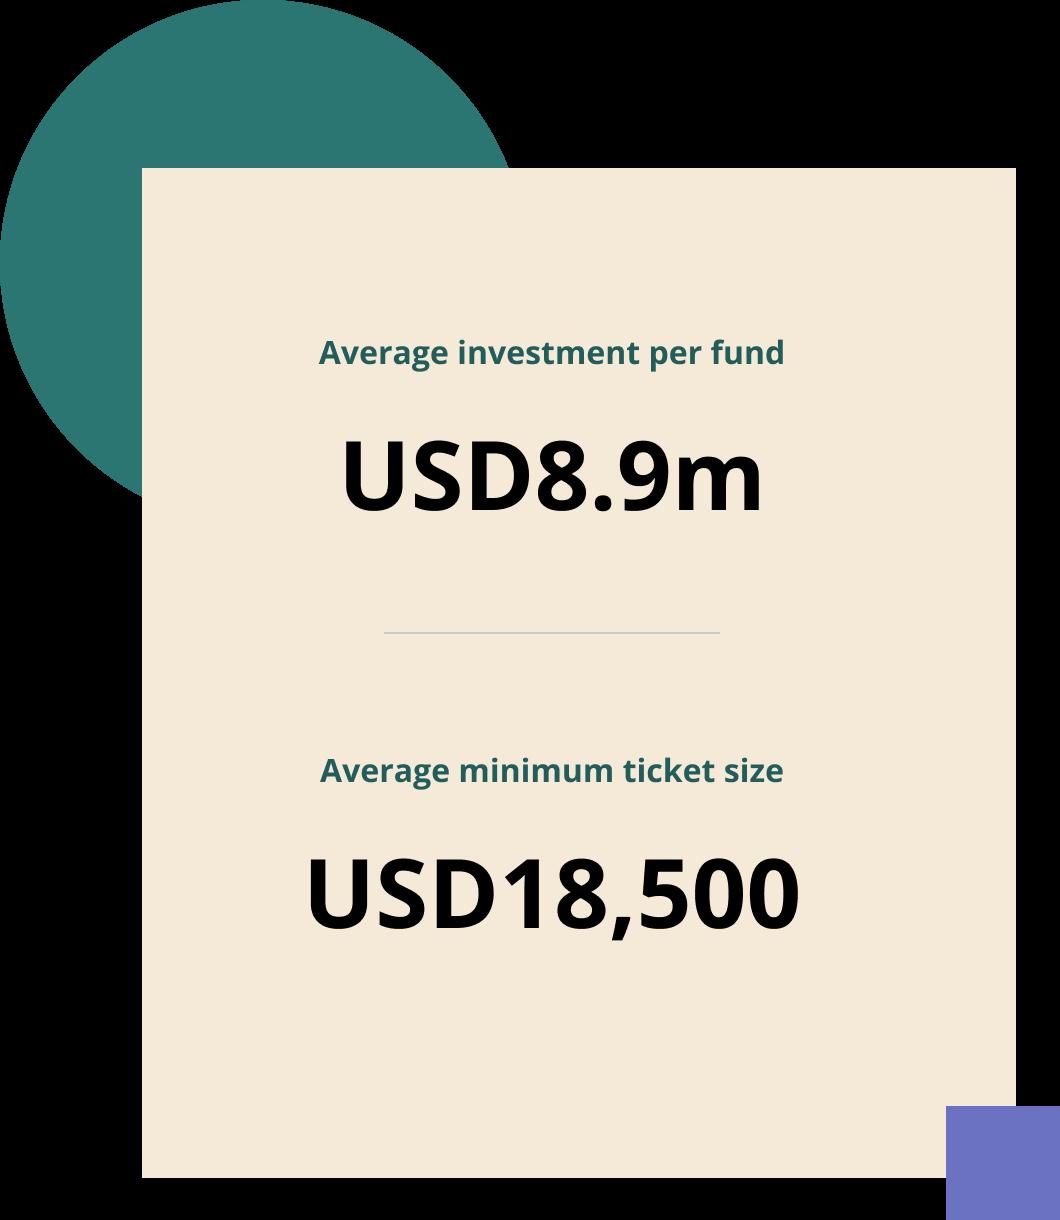 Average investment per fund: USD 8.9m and average minimum ticket size USD 18,500.